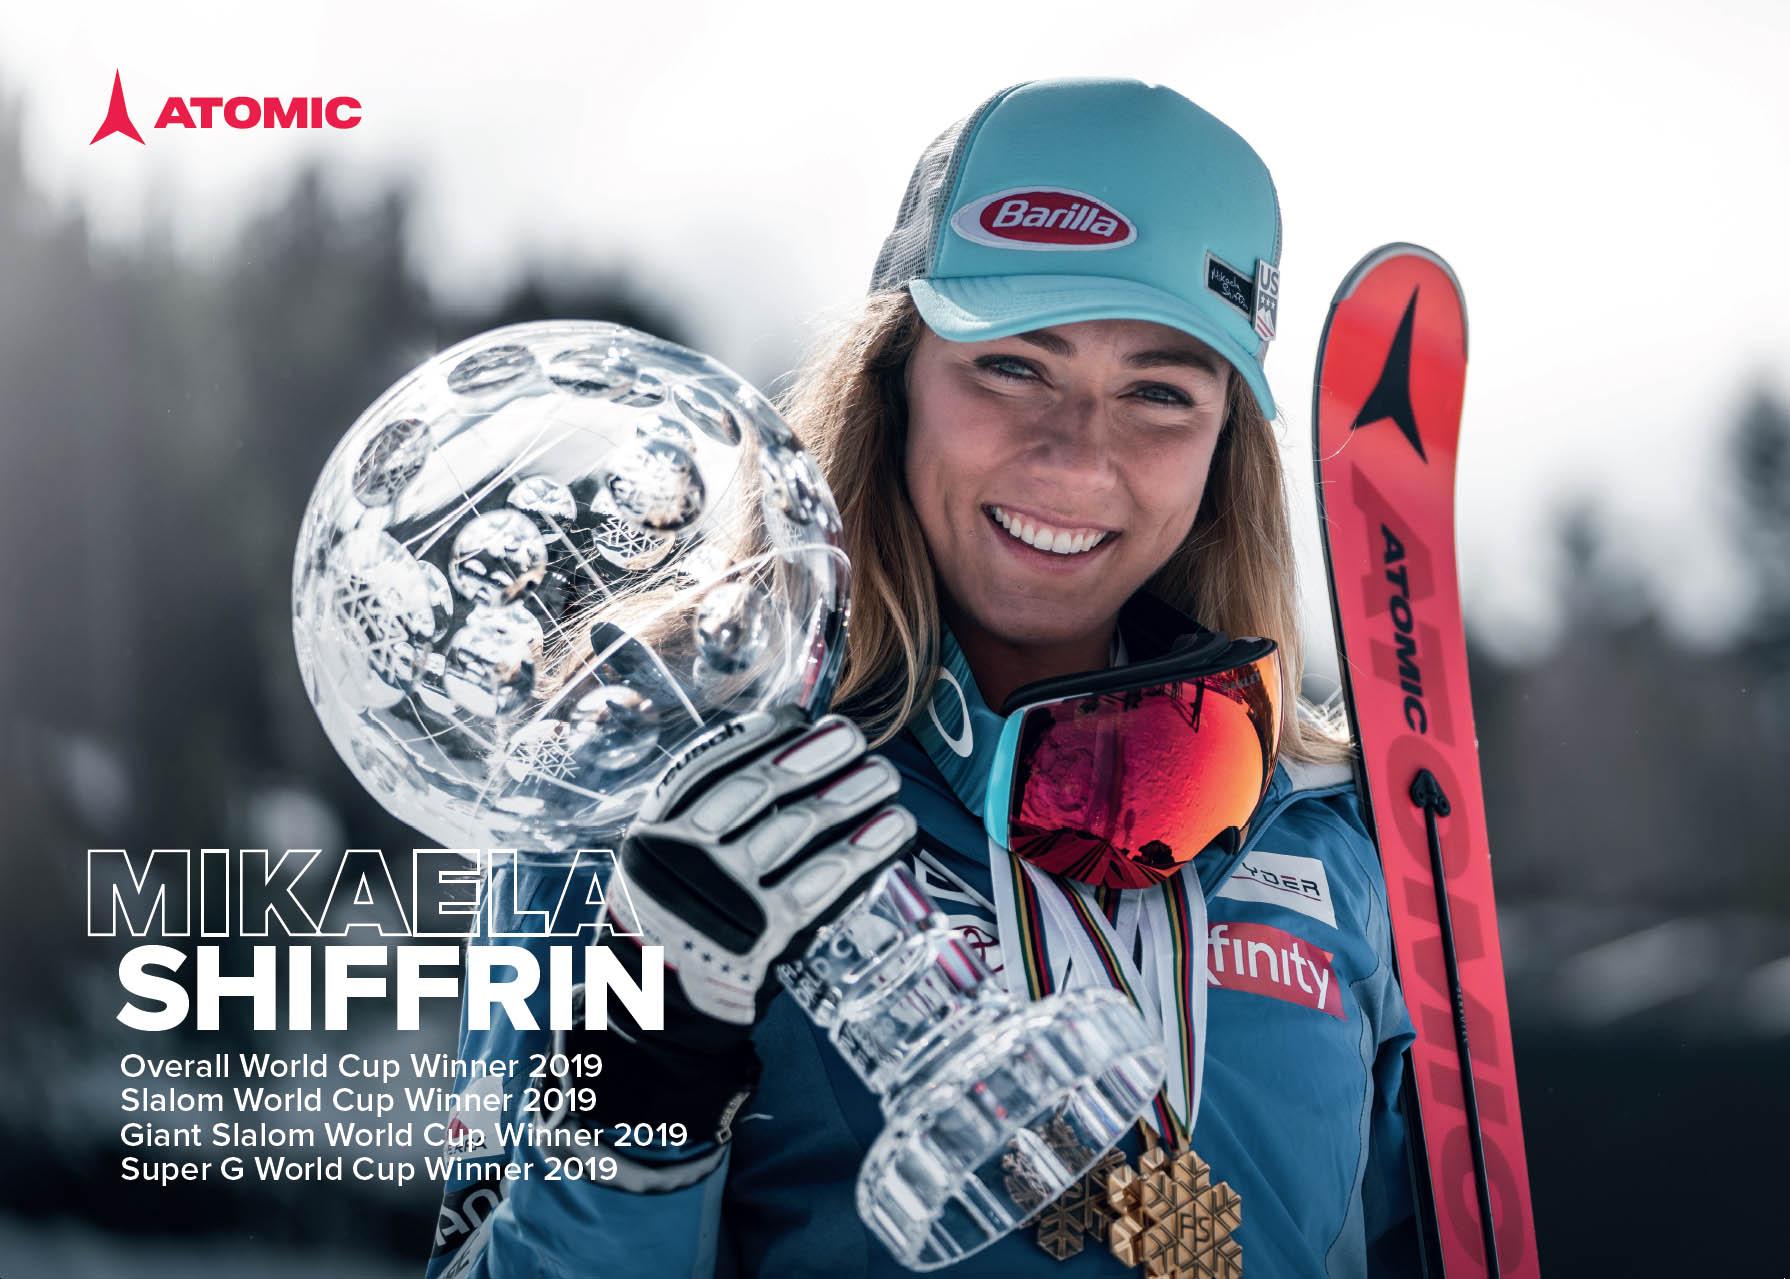 Mikaela-Shiffrin